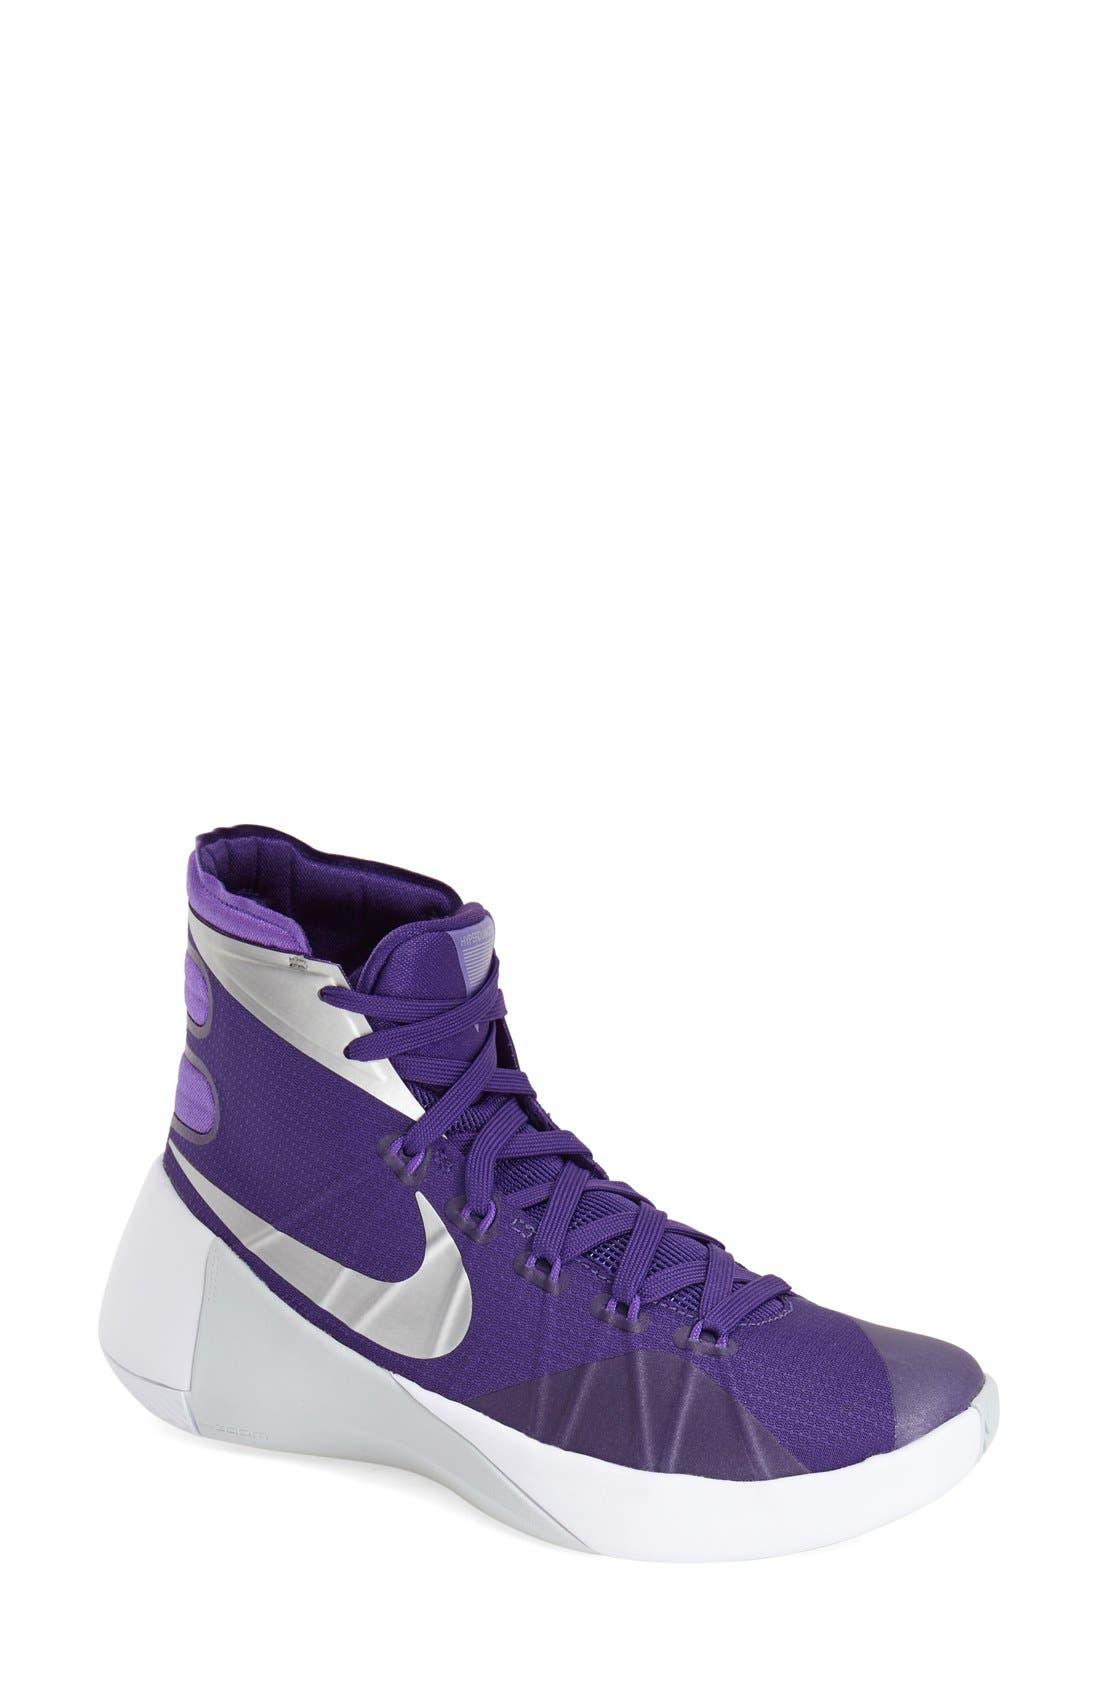 Alternate Image 1 Selected - Nike 'Hyperdunk 2015' Basketball Shoe (Women)